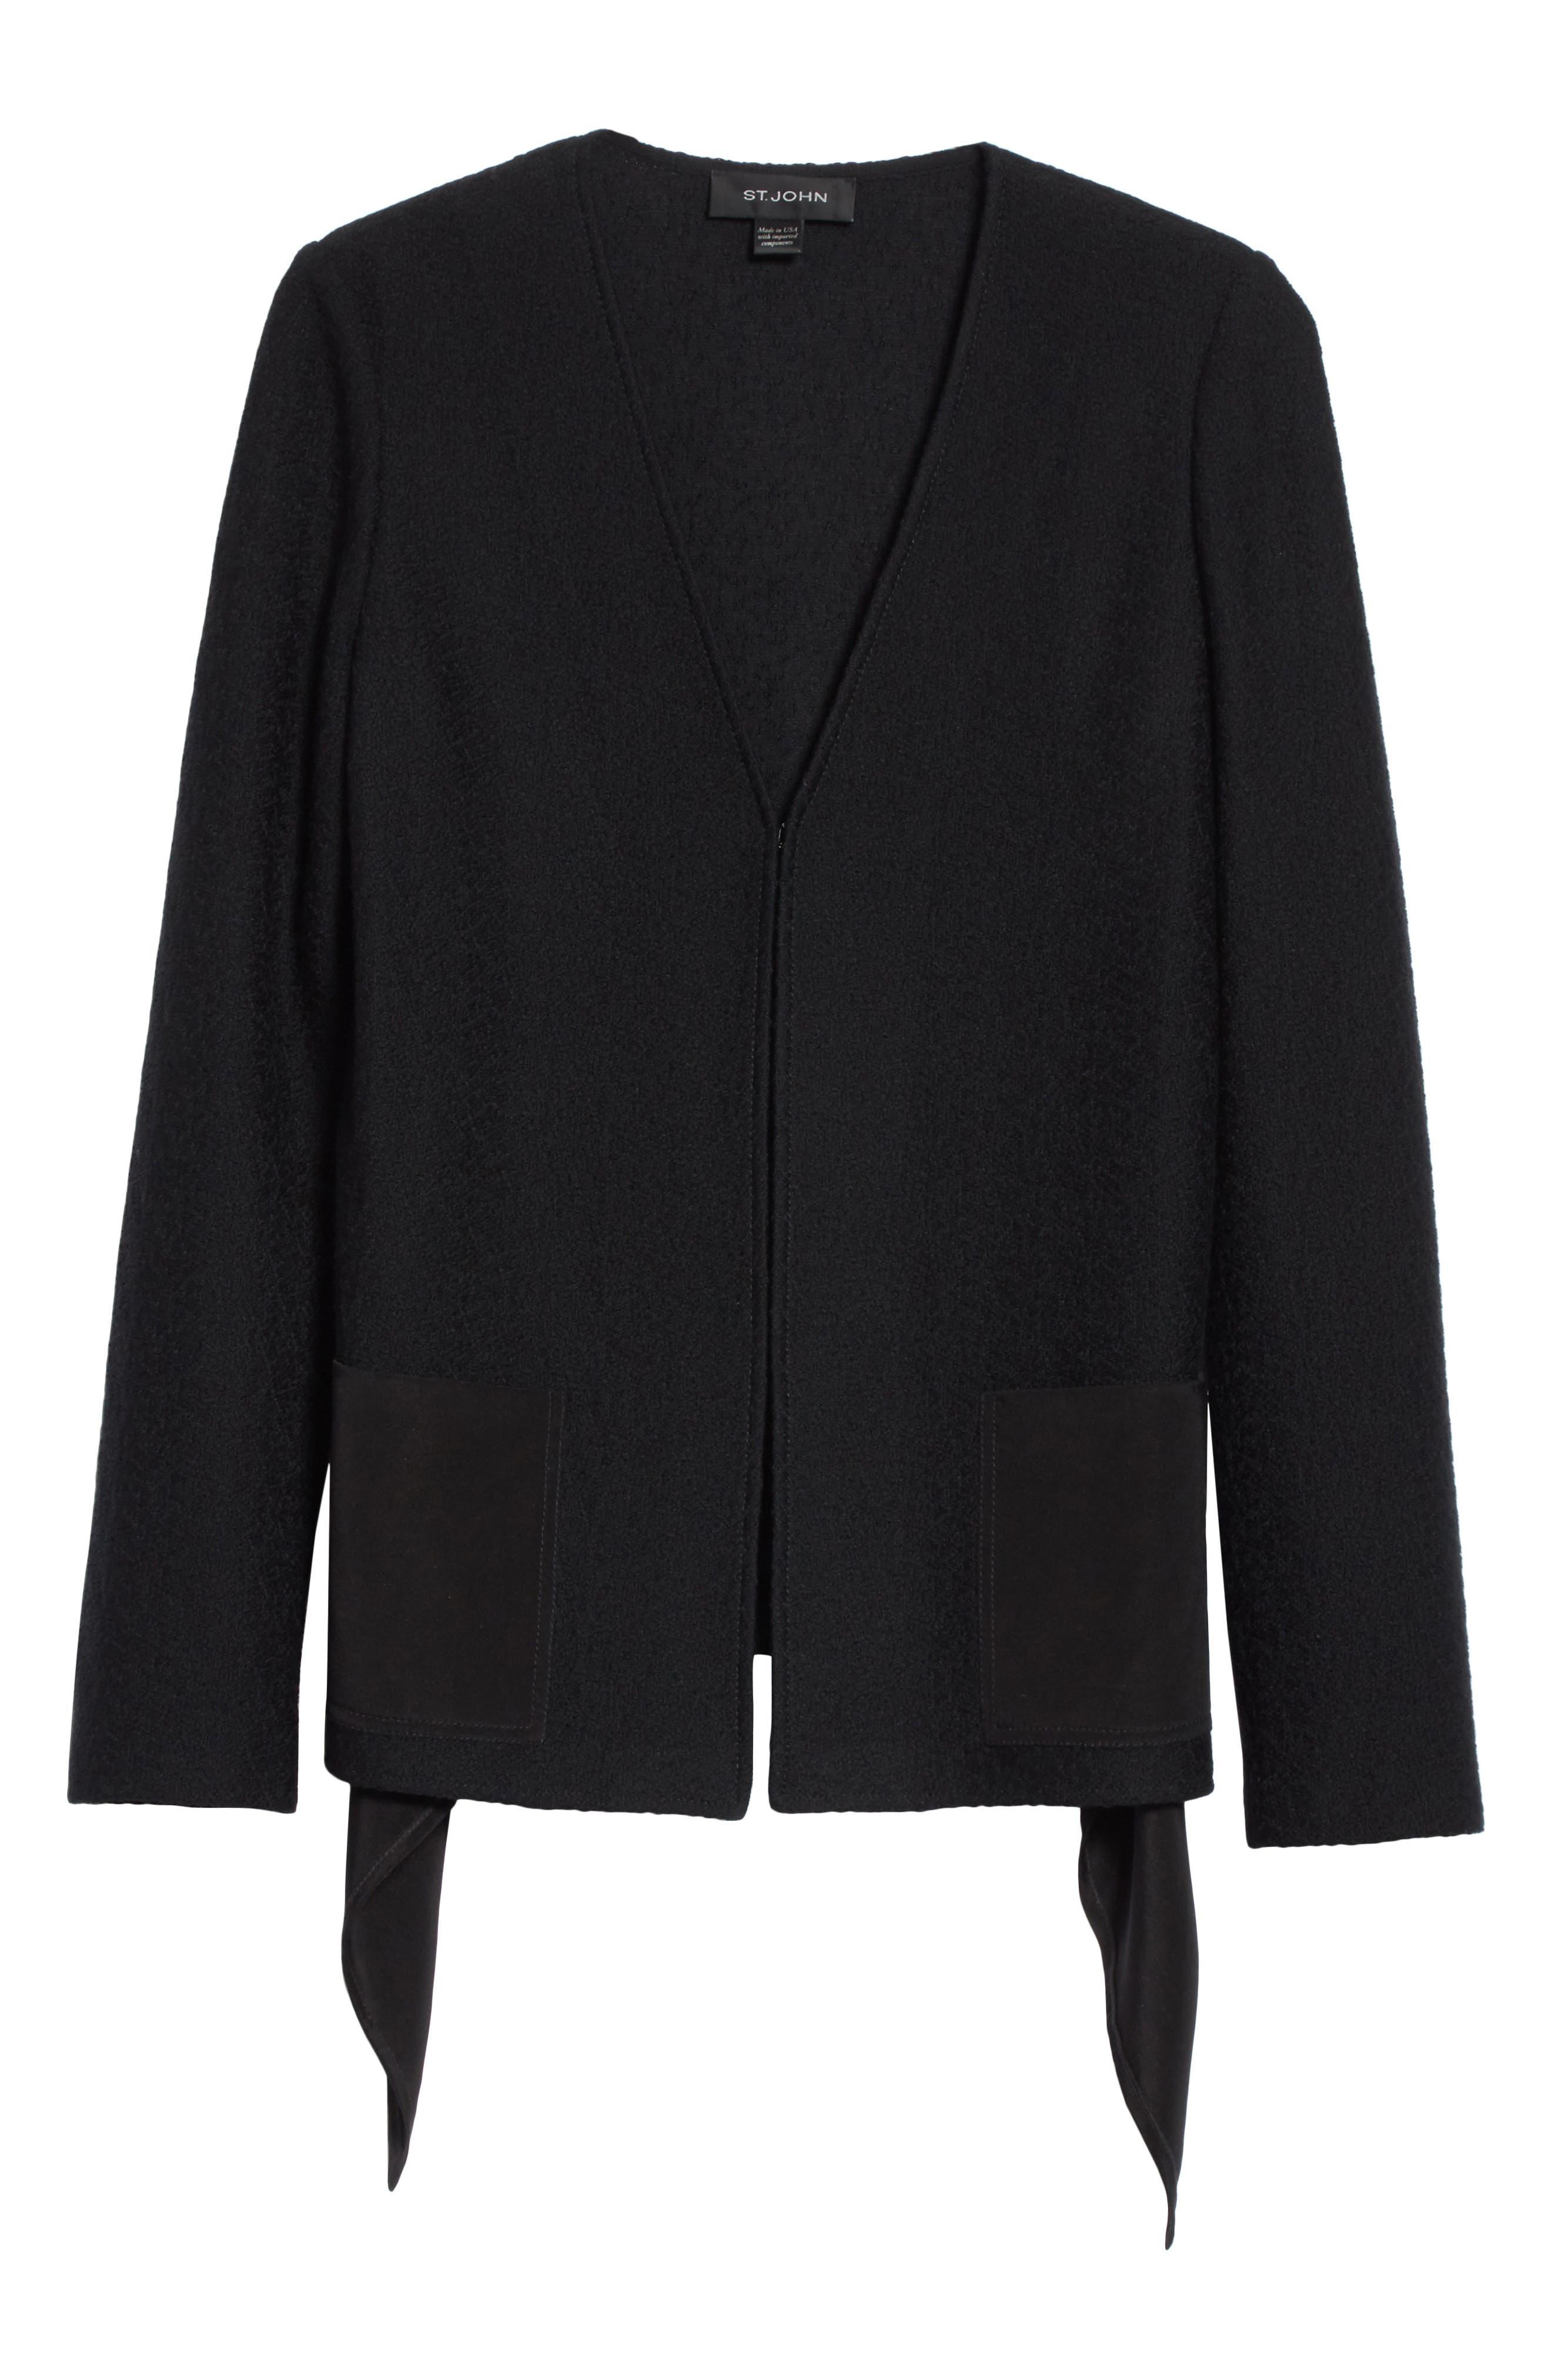 ST. JOHN COLLECTION,                             Hannah Knit A-Line Jacket,                             Alternate thumbnail 5, color,                             001